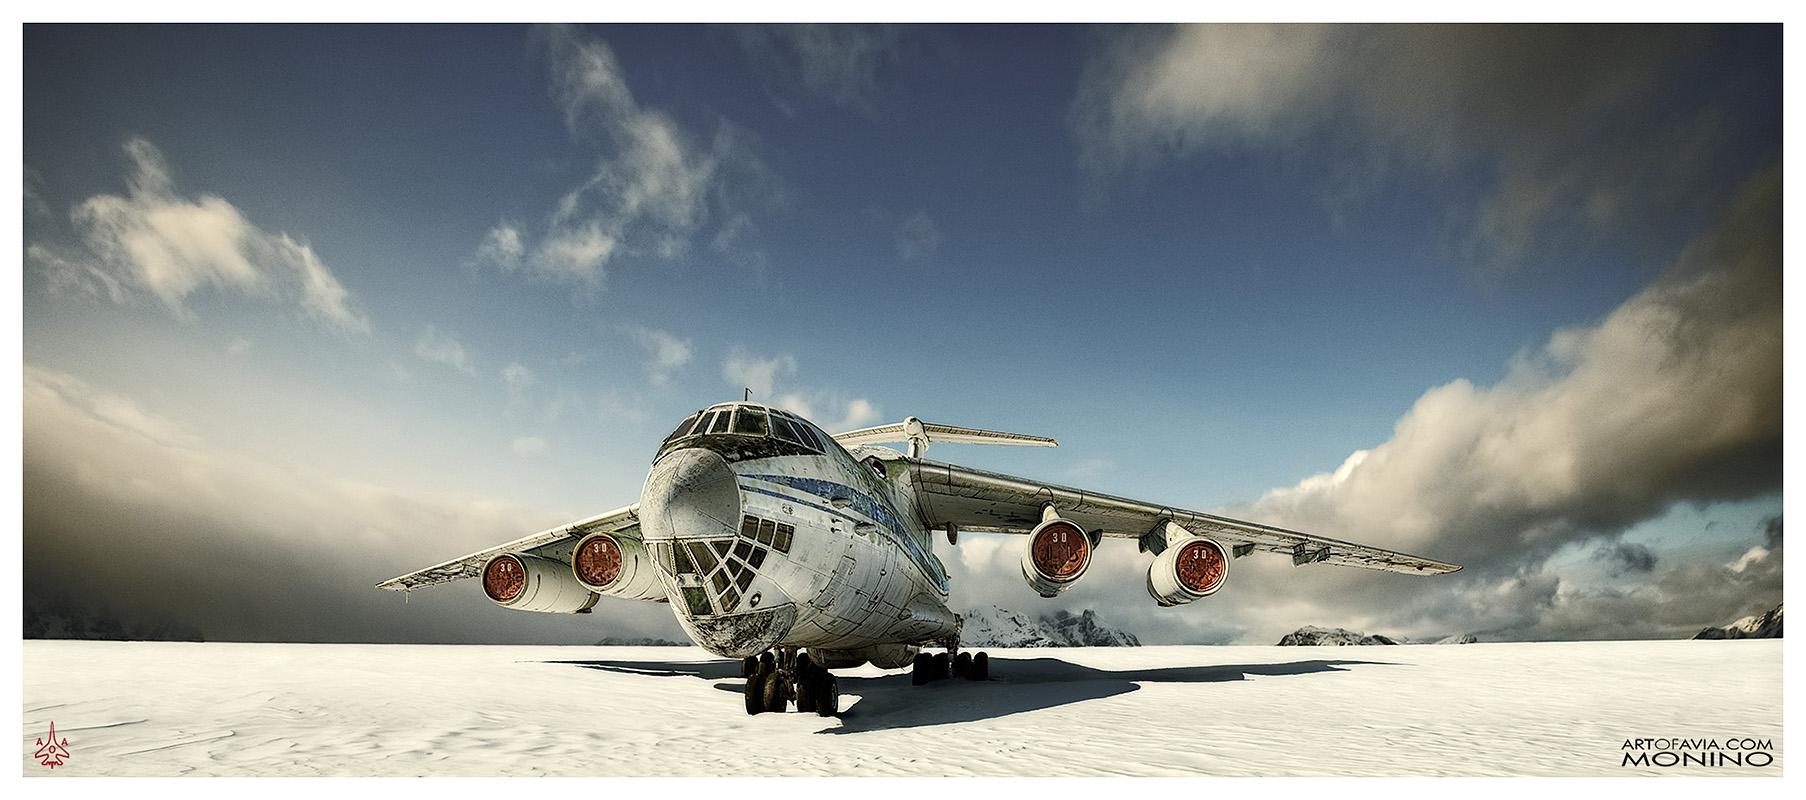 Ilyushin-Il-76-Art-of-Avia-Central-Air-Force-Museum-Monino-by-Kent-Miklenda-800pxh-21-9-IL-CT-A-BW.jpg